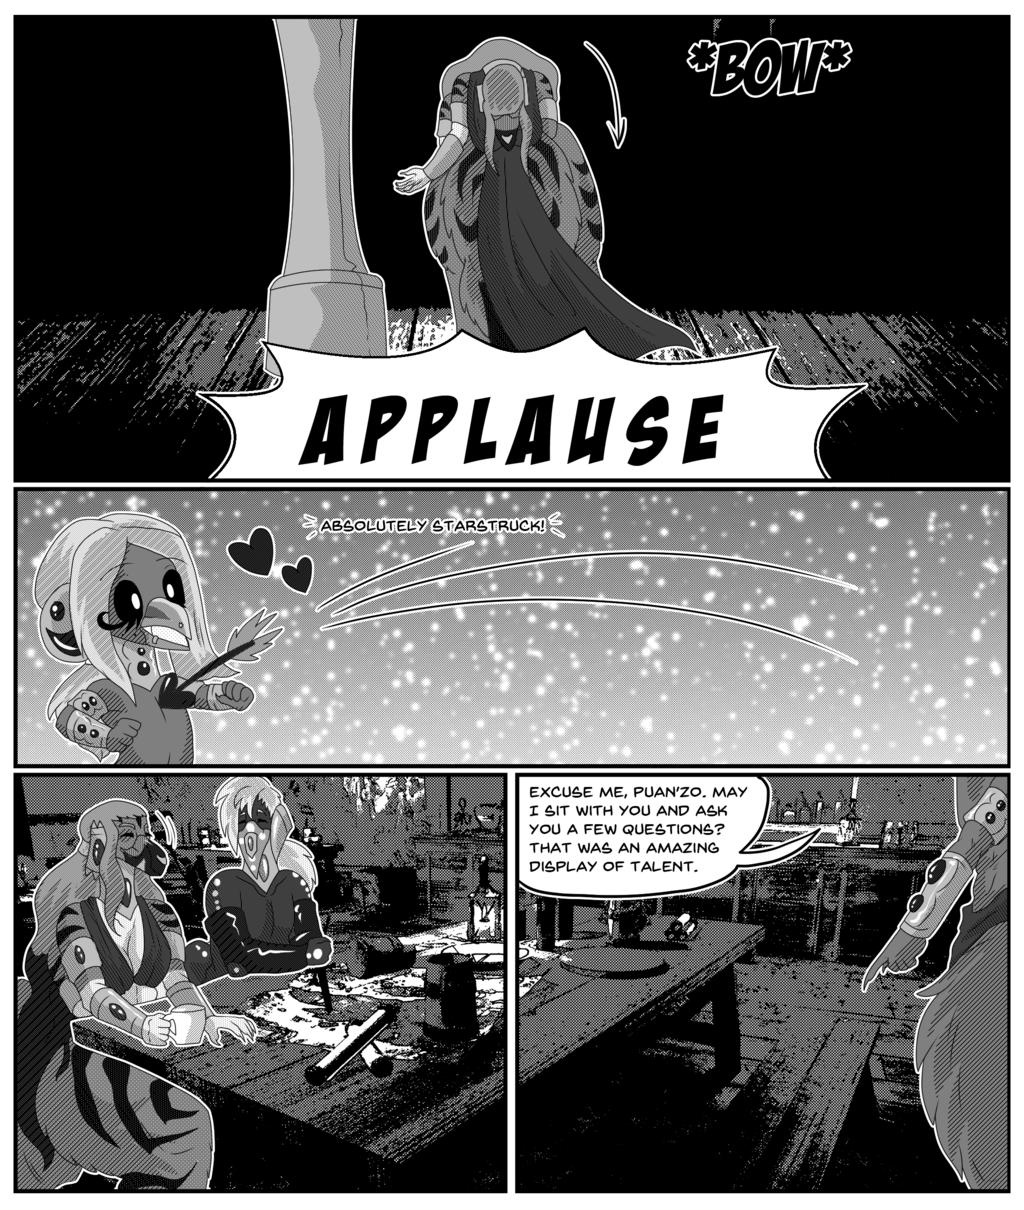 Heart-felt Hunter, Page 22